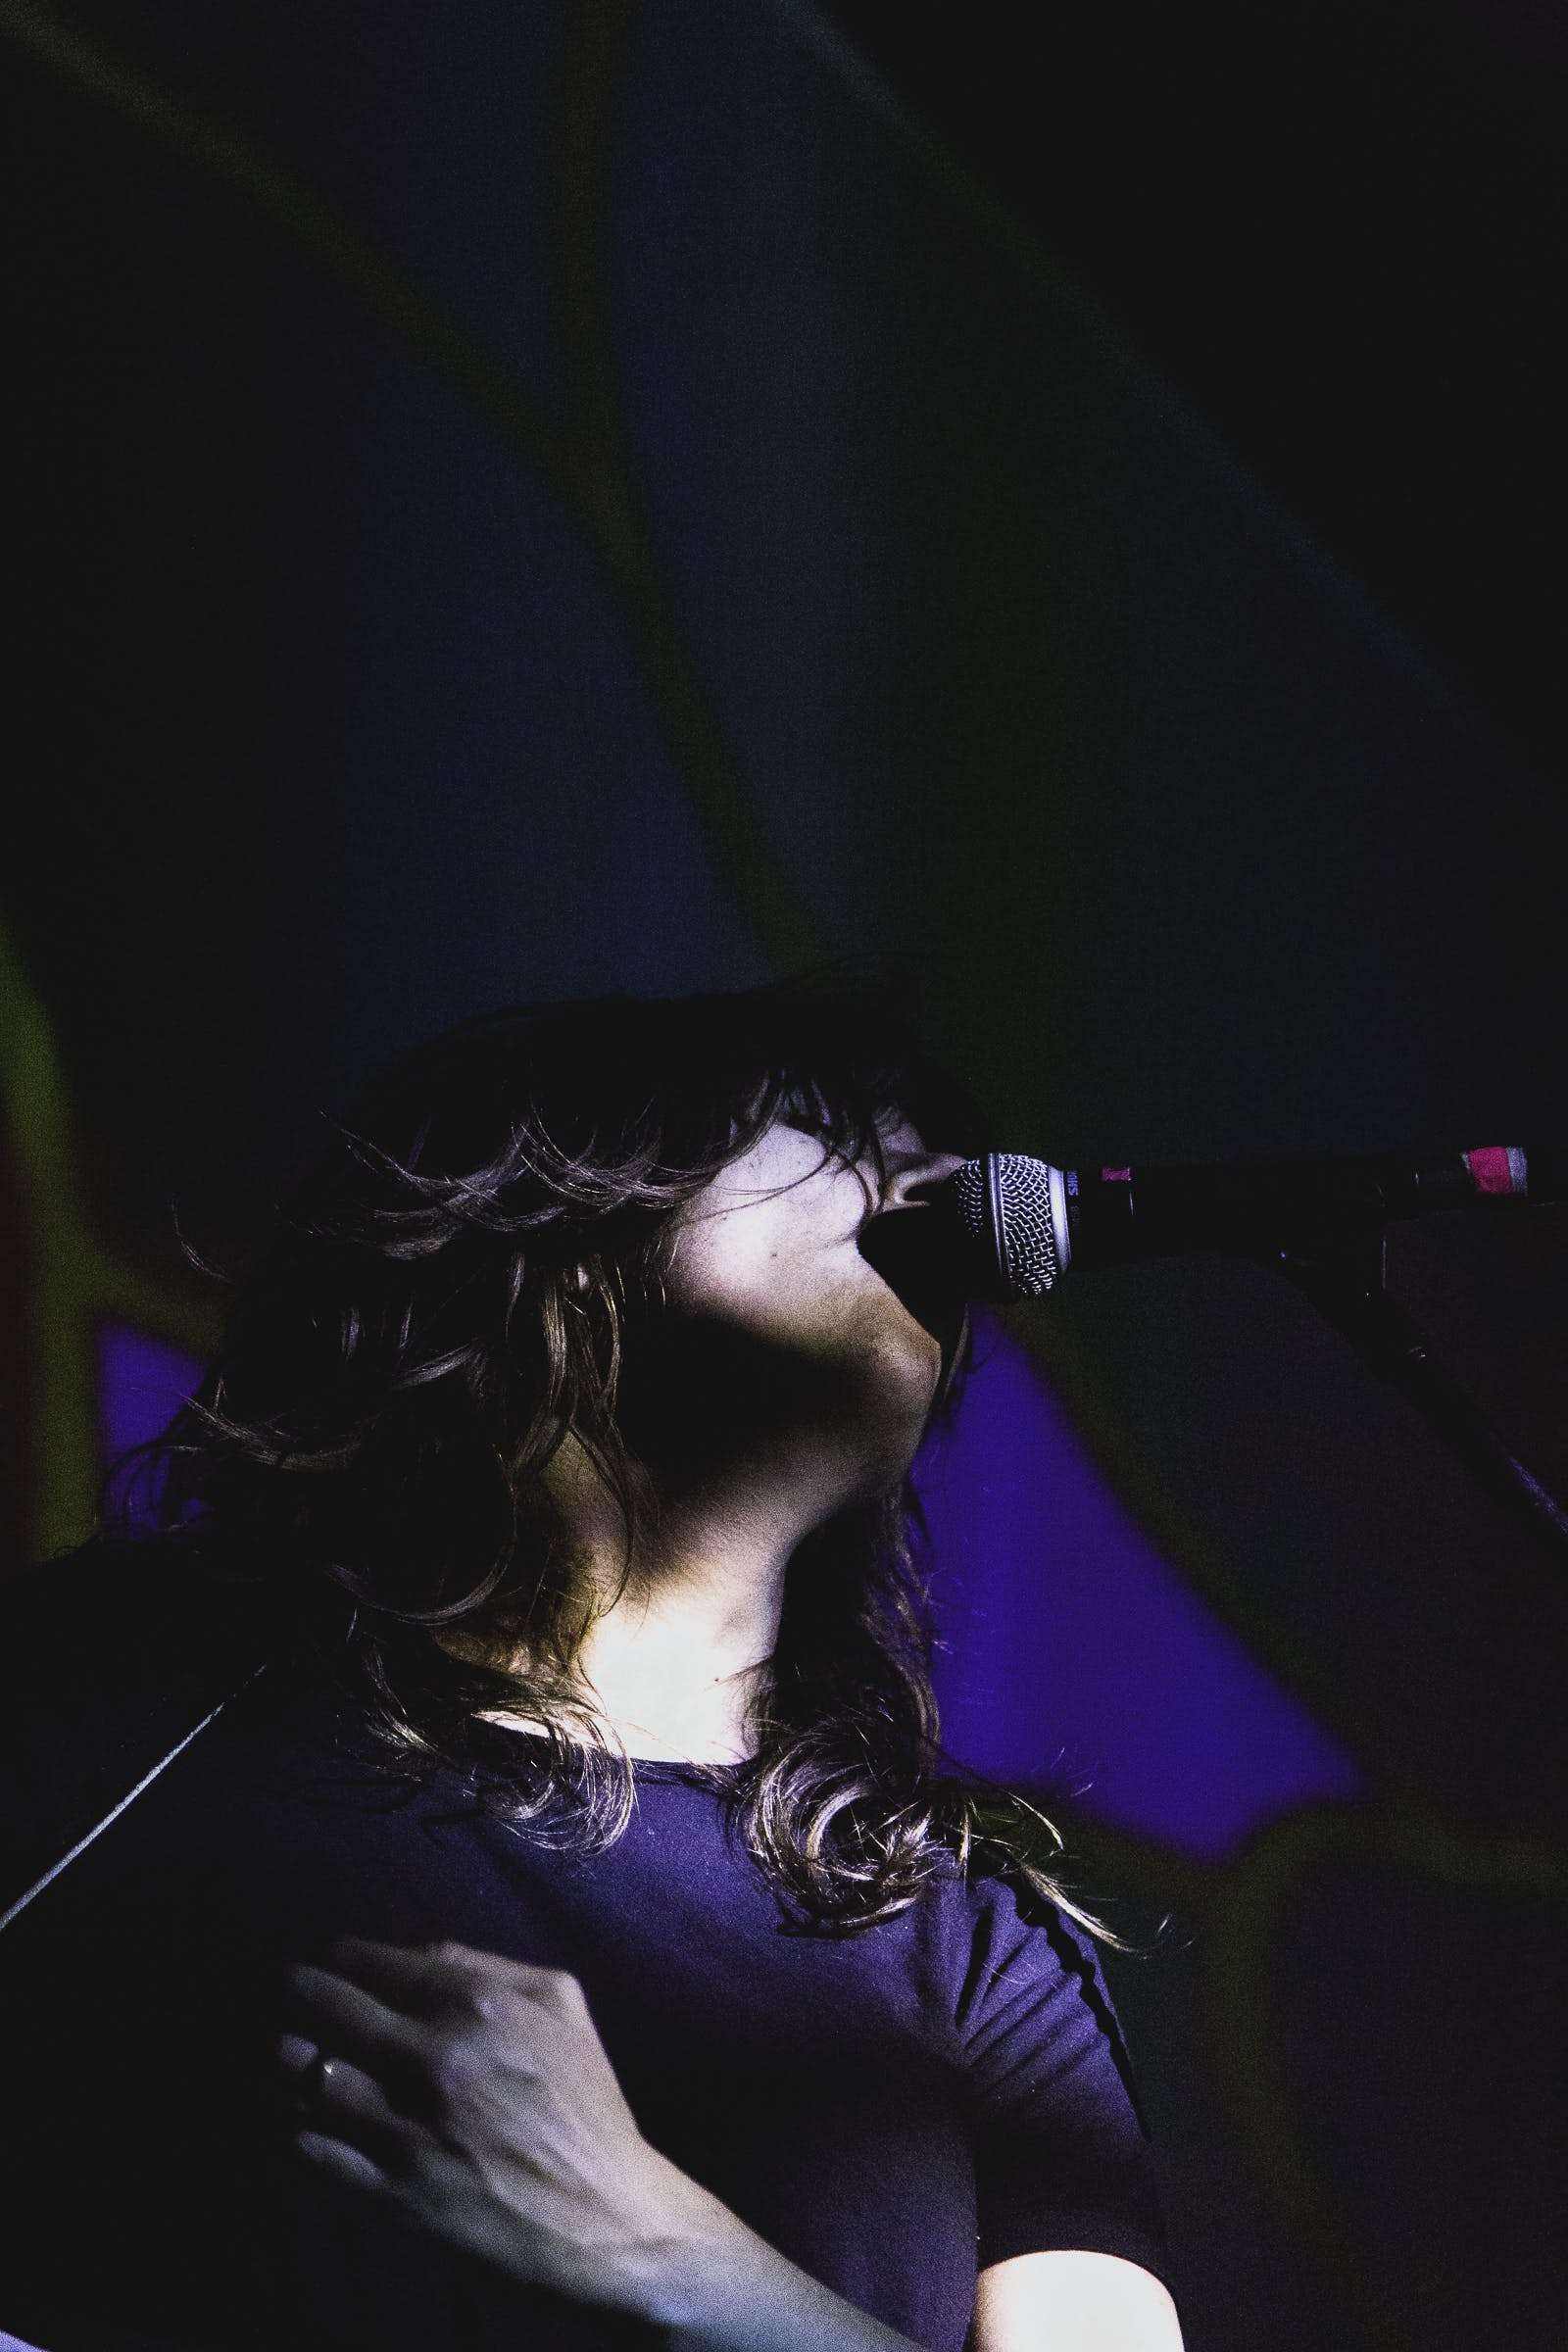 Woman Using Microphone